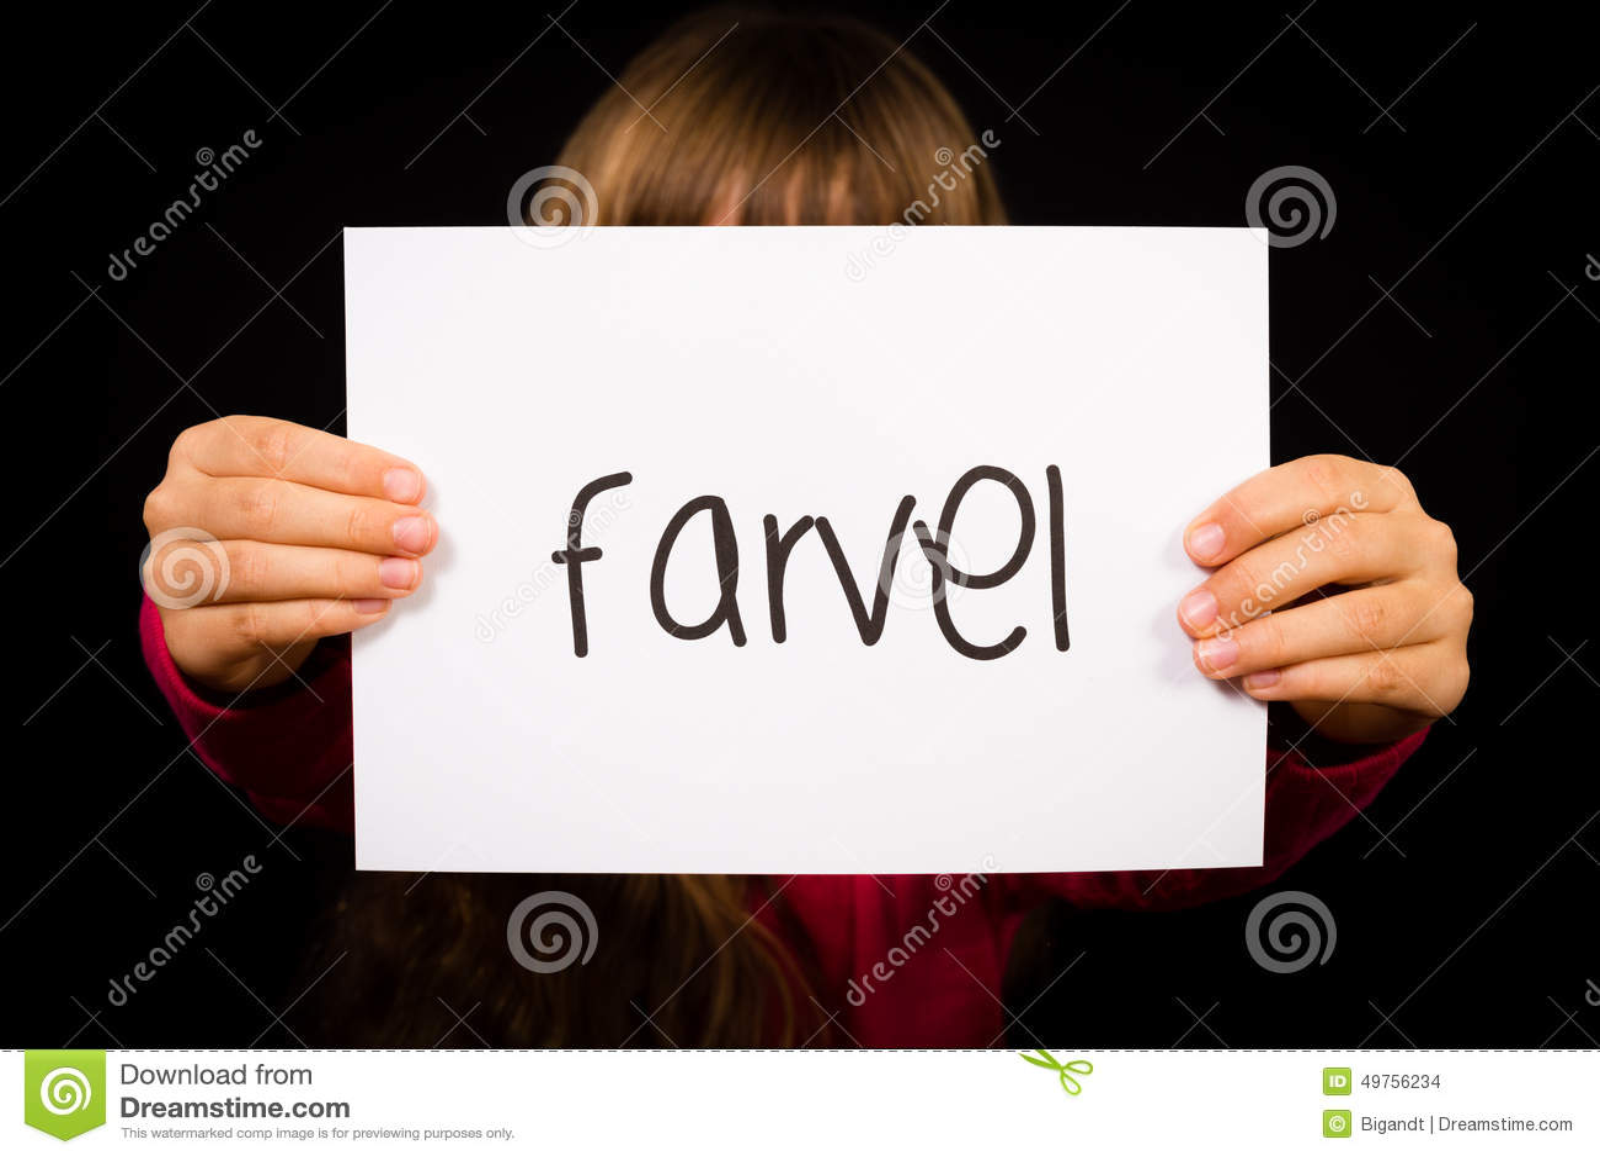 farvel danish